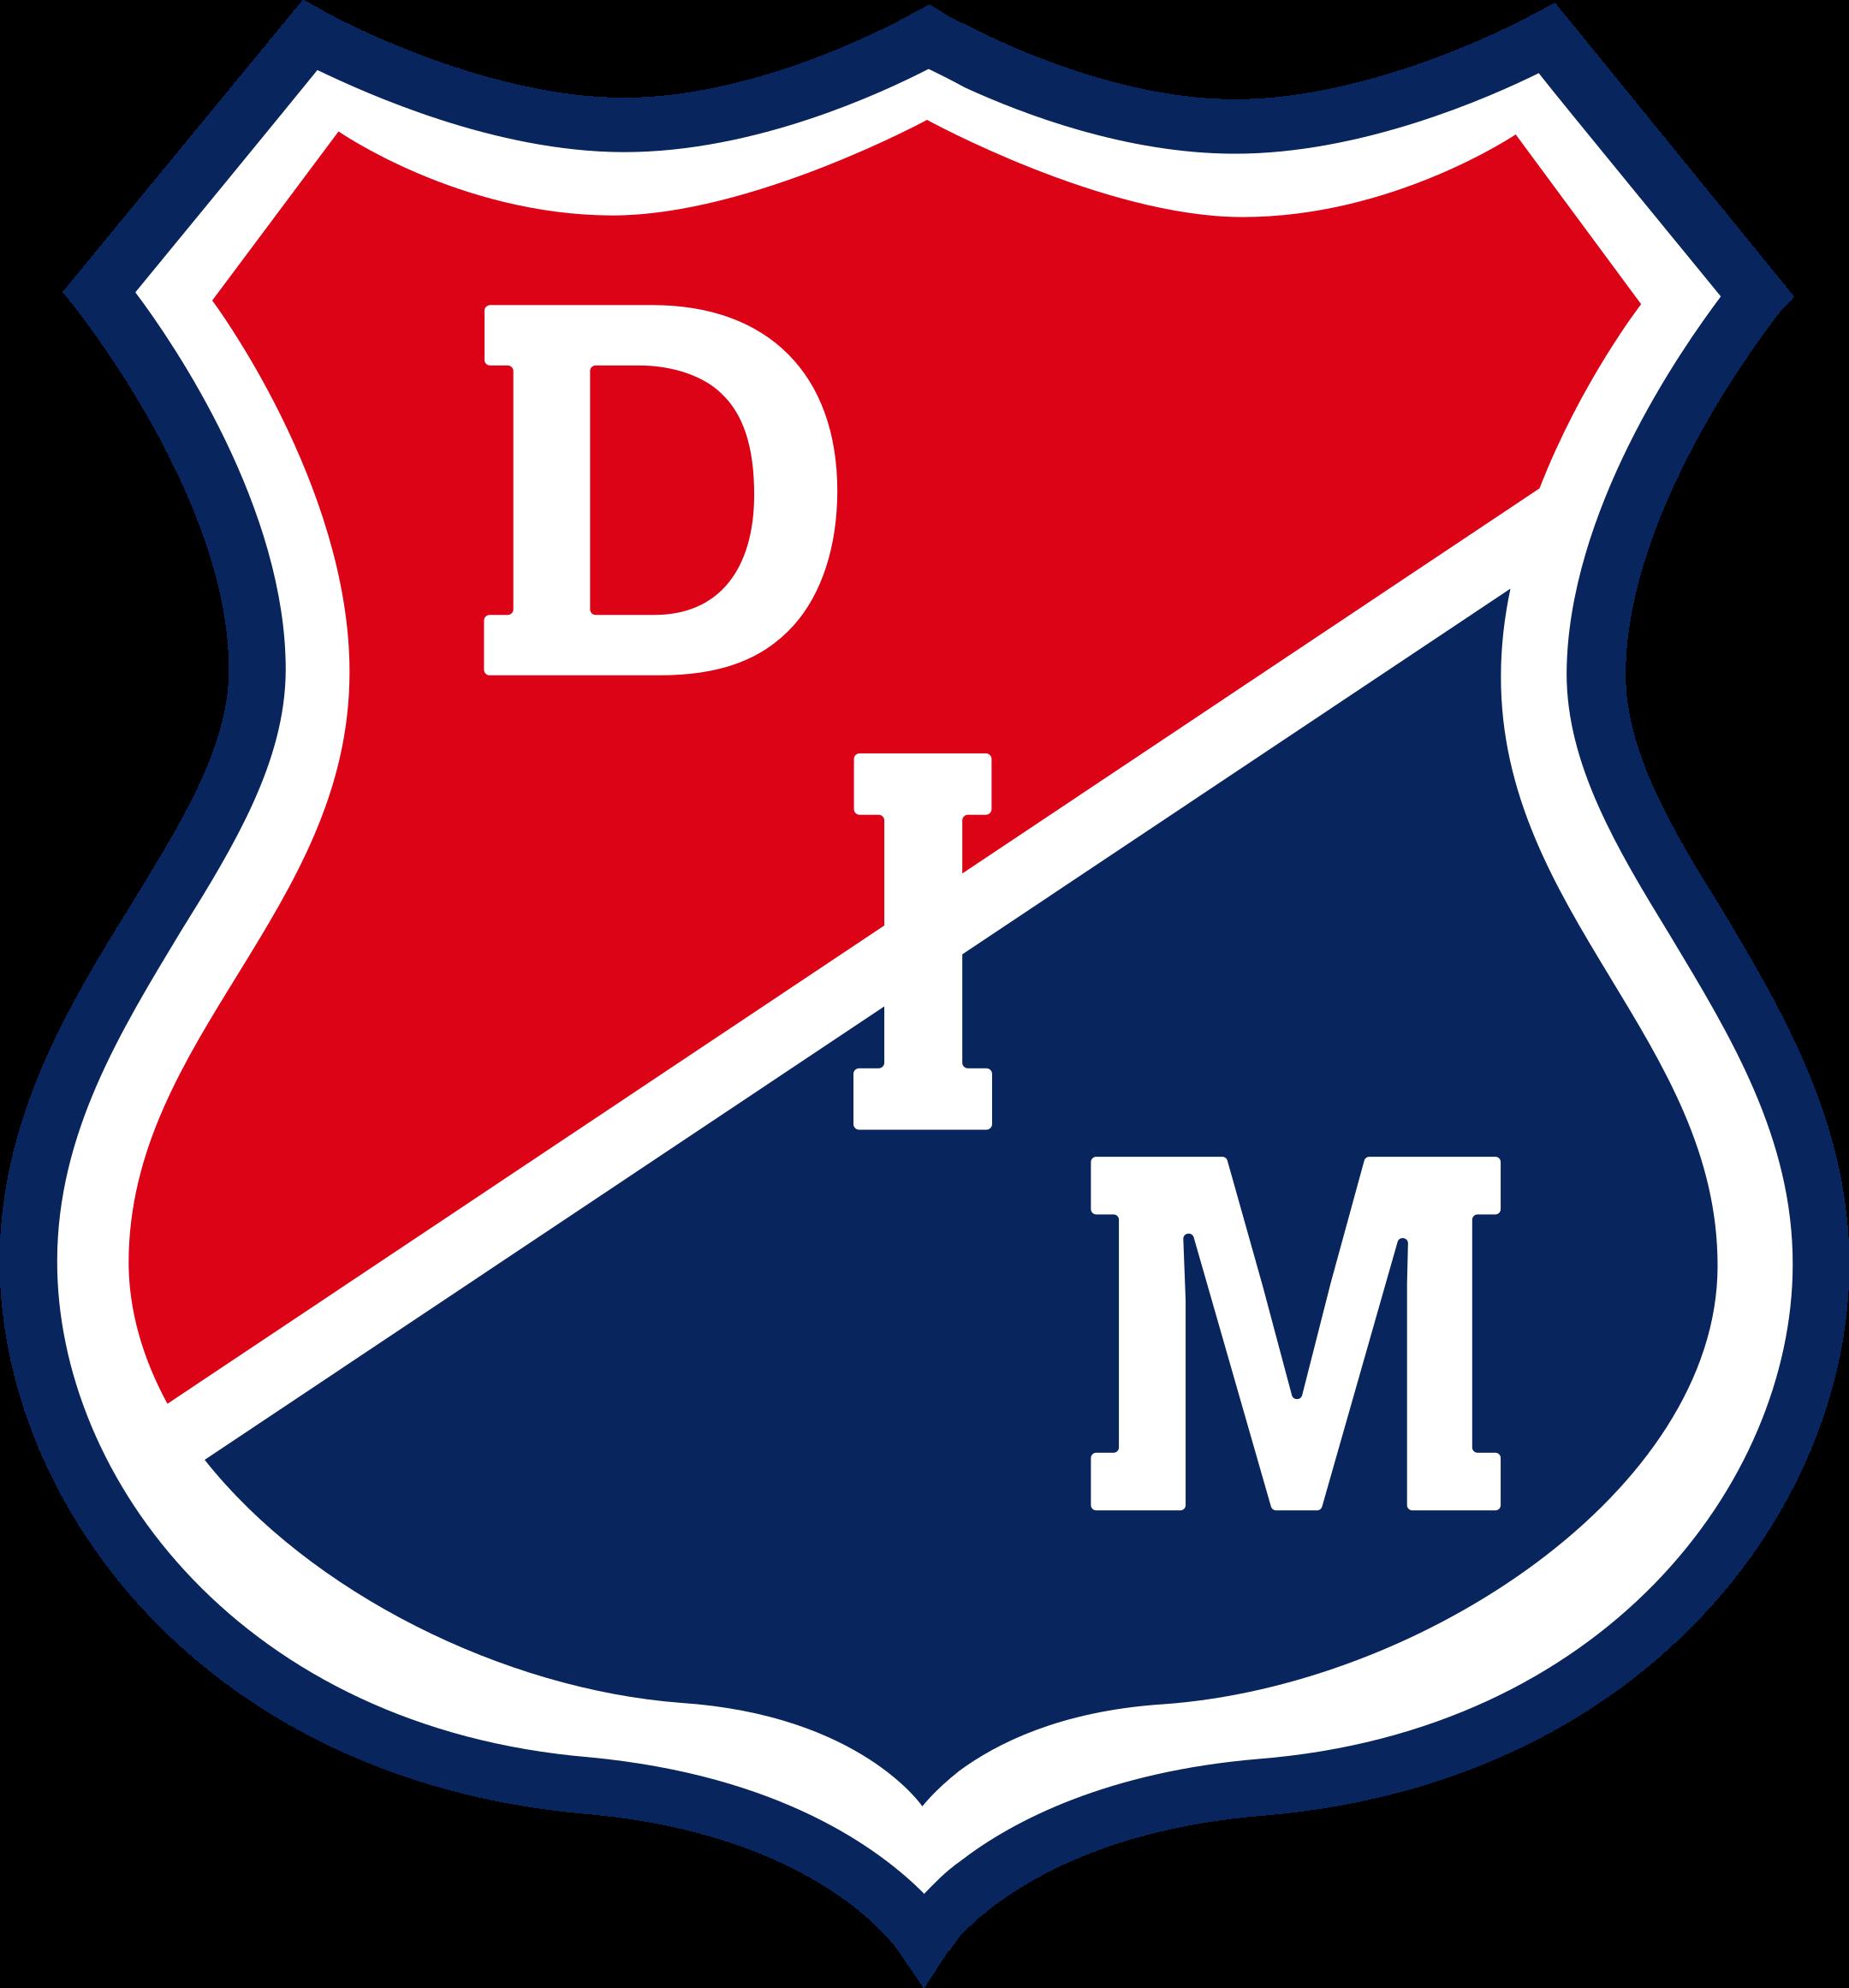 independiente medellin logo 1 - Independiente Medellín Logo